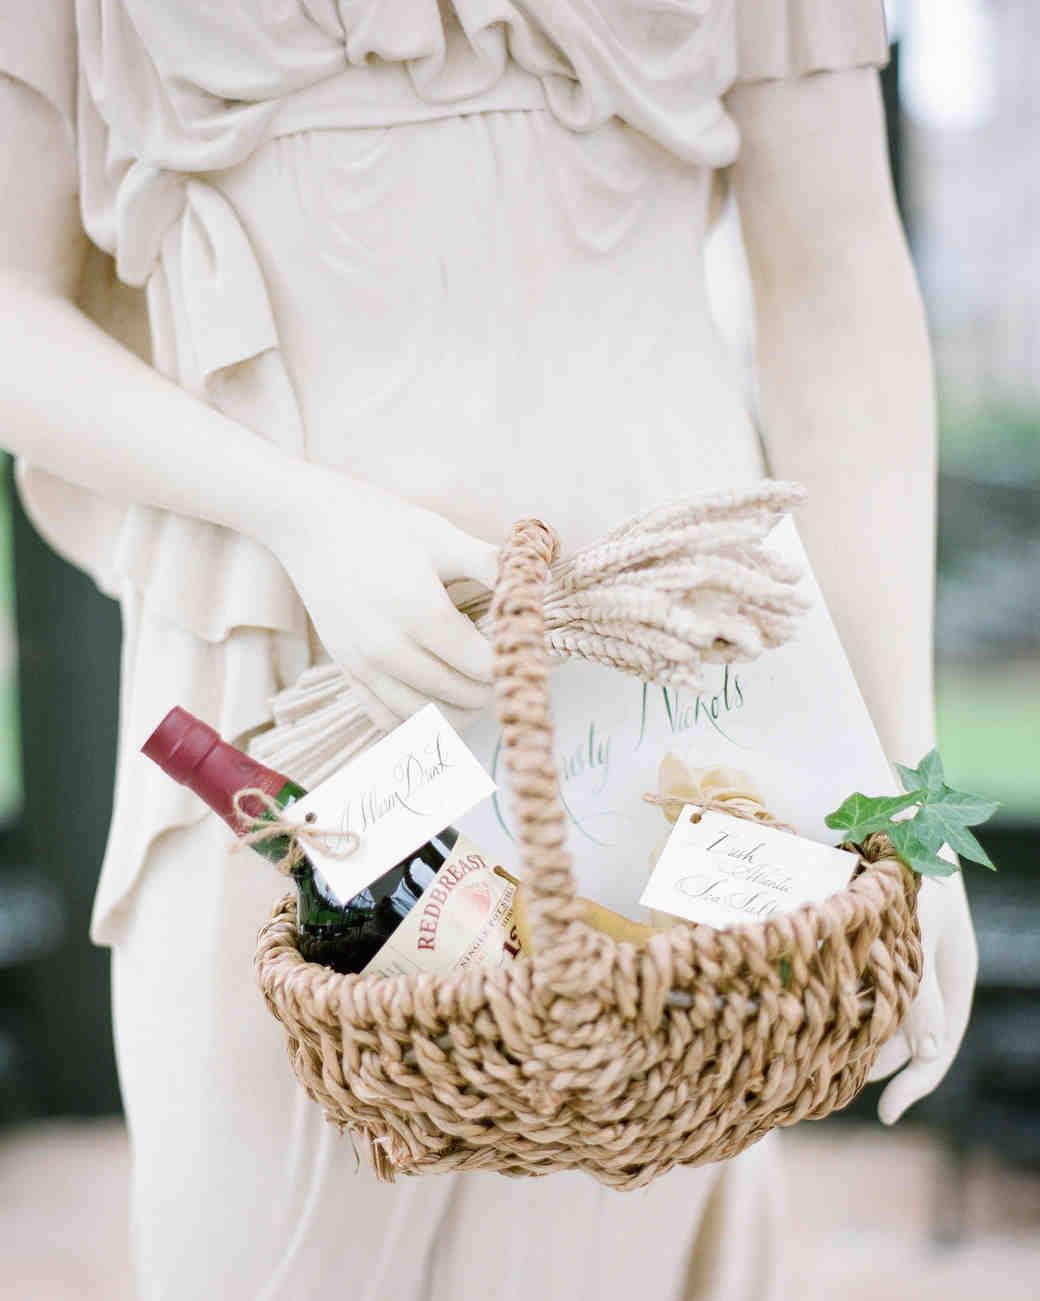 jo-andrew-wedding-ireland-0949-s112147.jpg